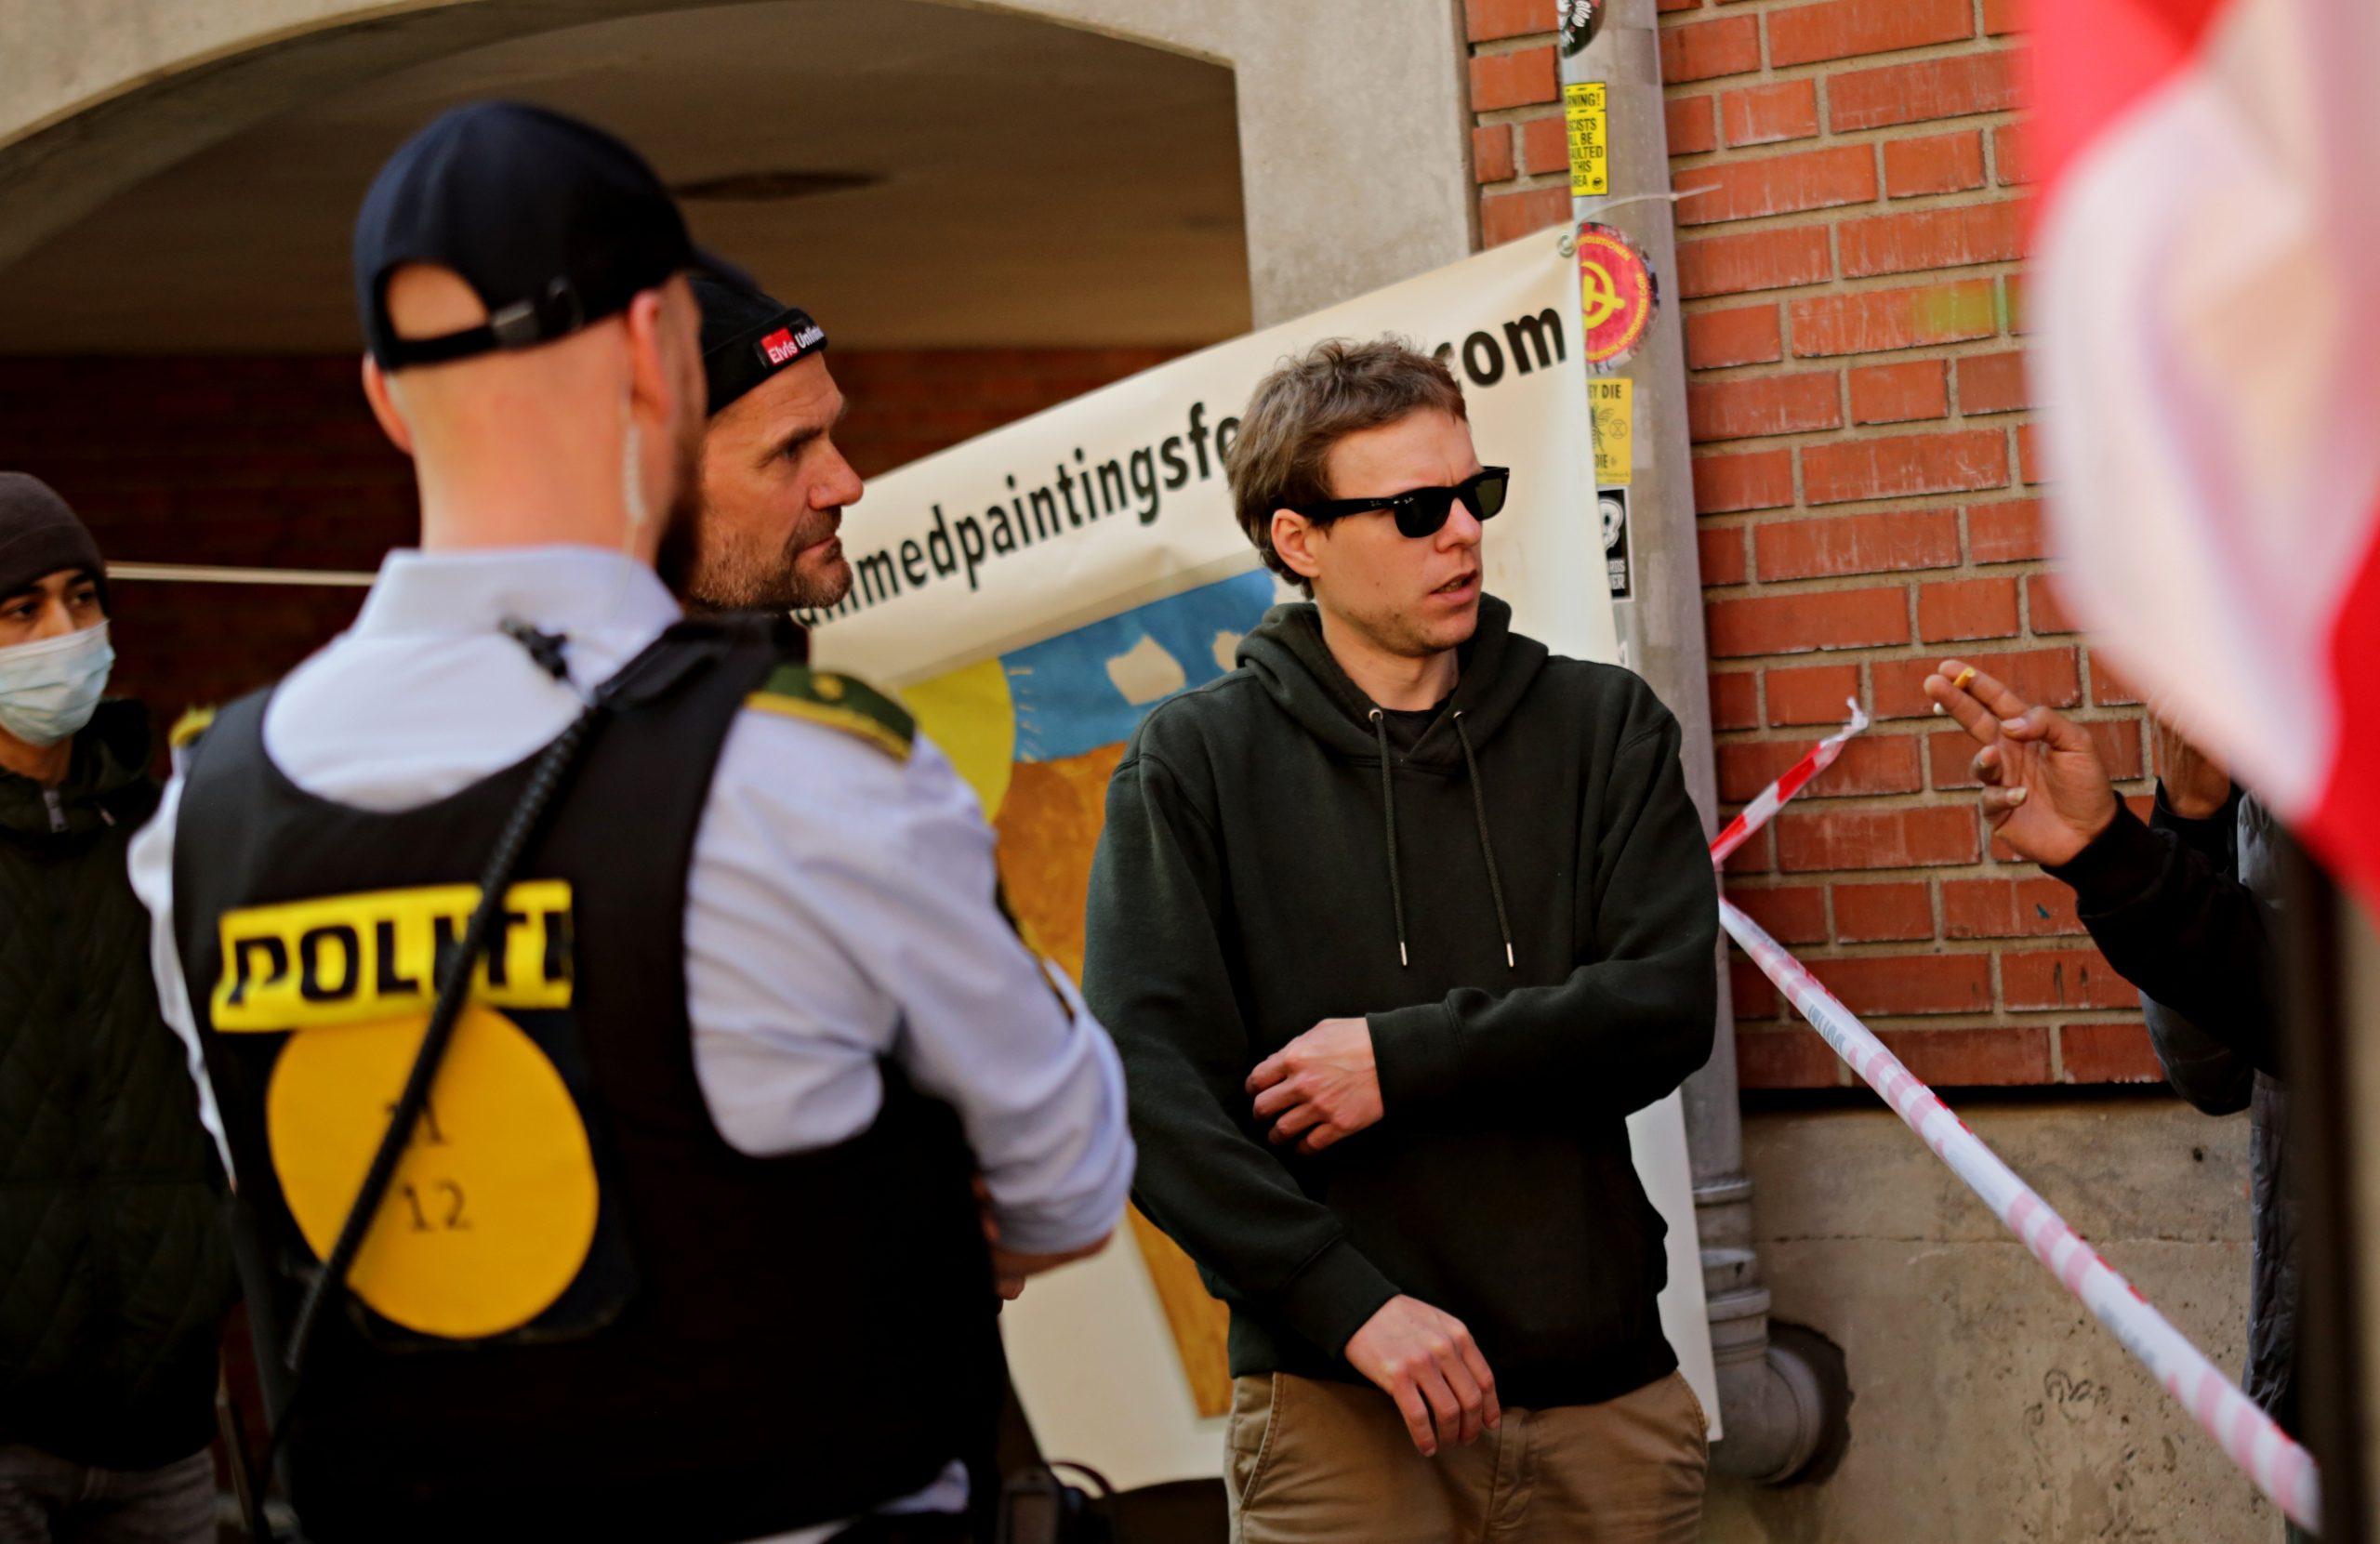 Dennis Corell Iversen (med solbriller) og John Lydeking Andersen under demonstrationen på Blågårds Plads i søndags. Foto: Redox